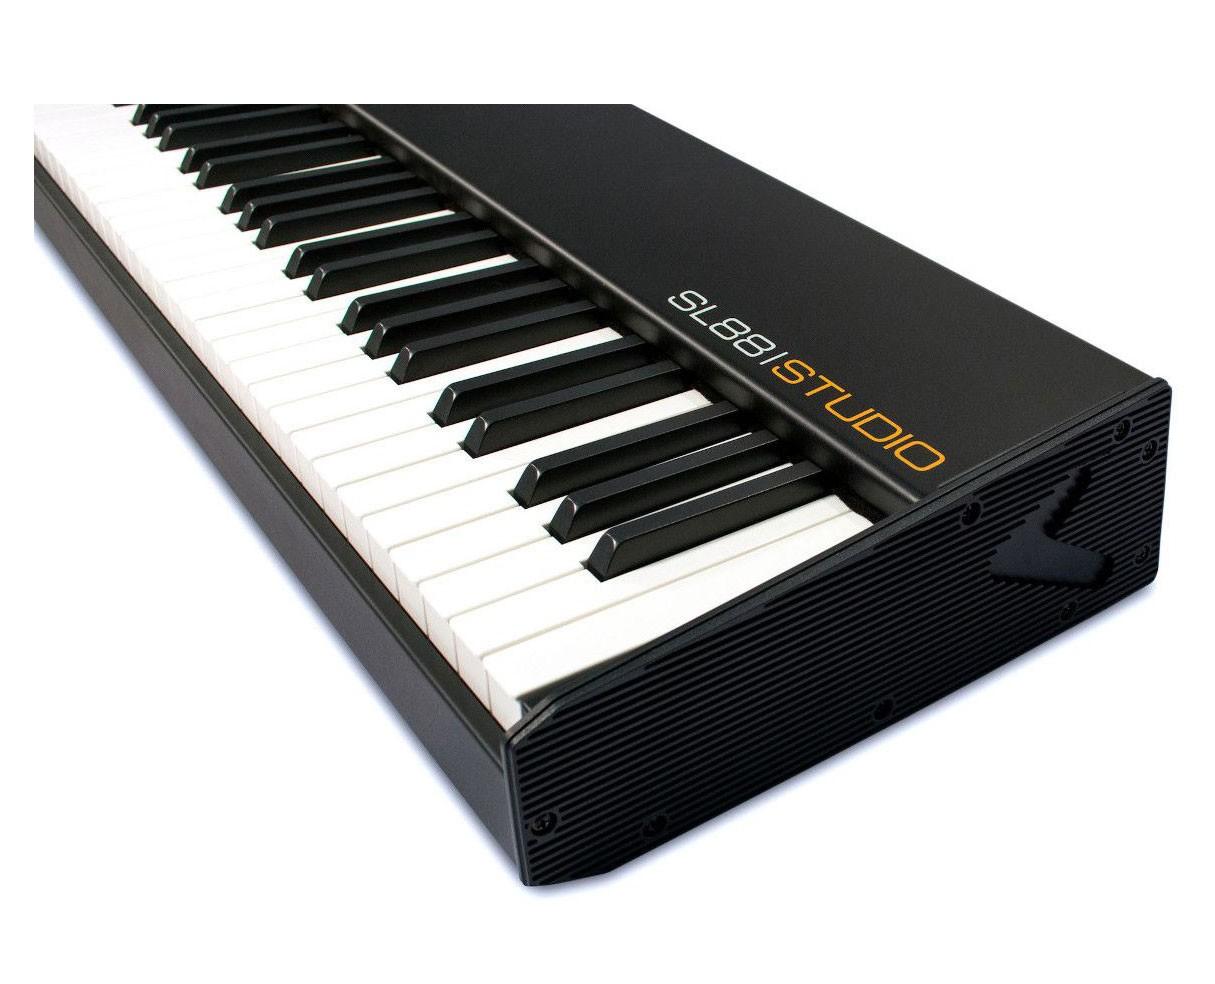 StudioLogic SL88 Studio 88-Key Piano